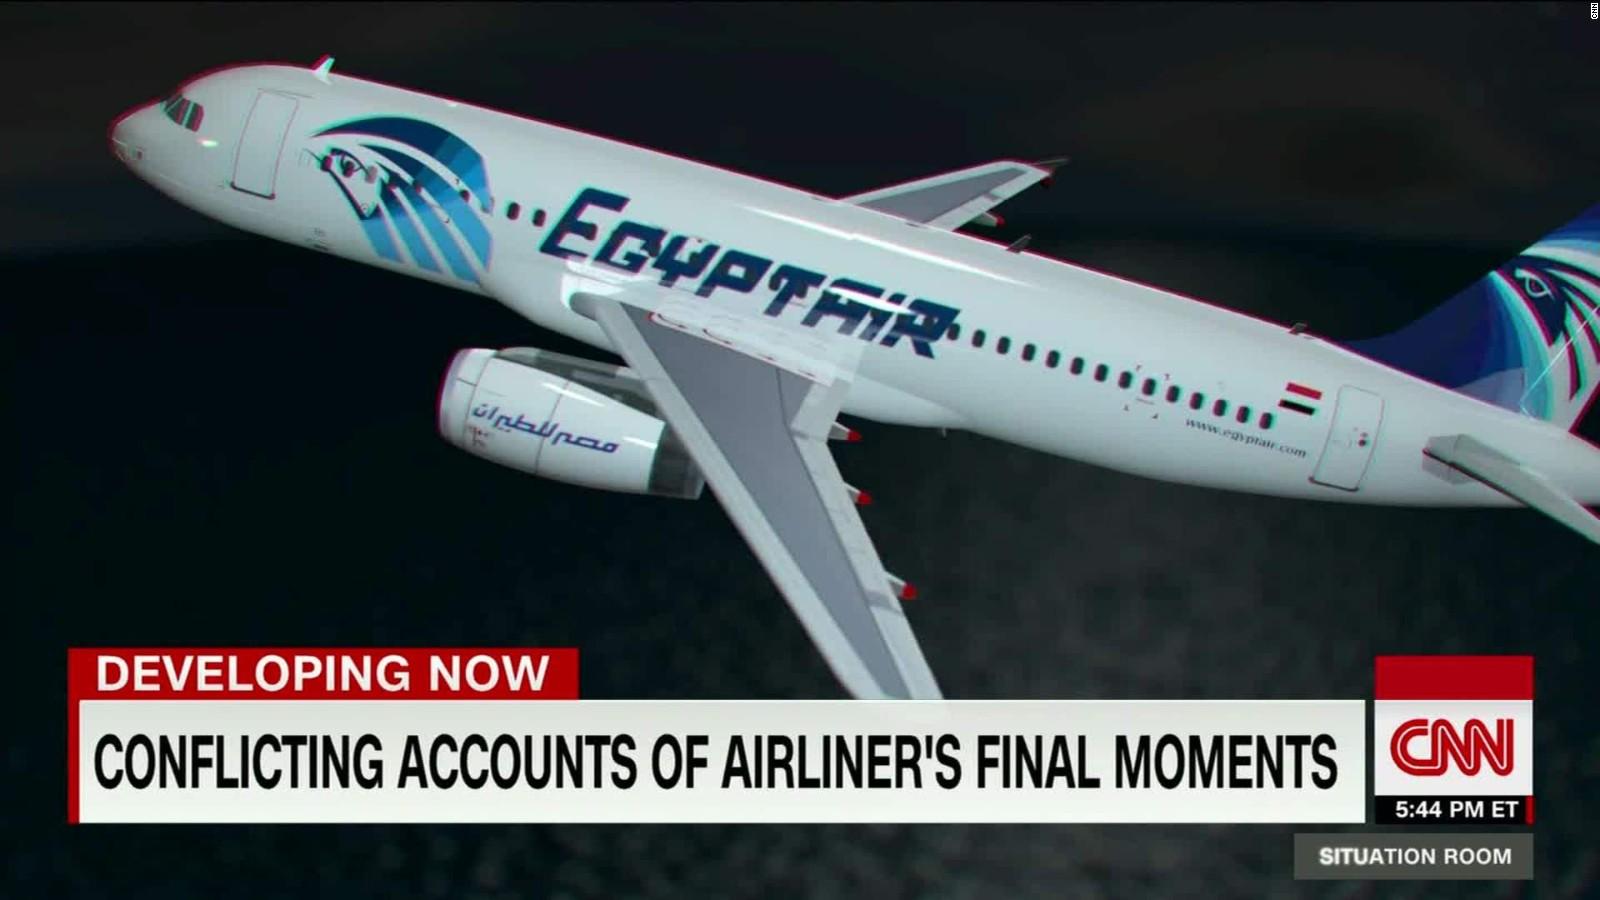 160524181215-egyptair-flight-804-investigation-conflicting-reports-todd-tsr-00000000-full-169